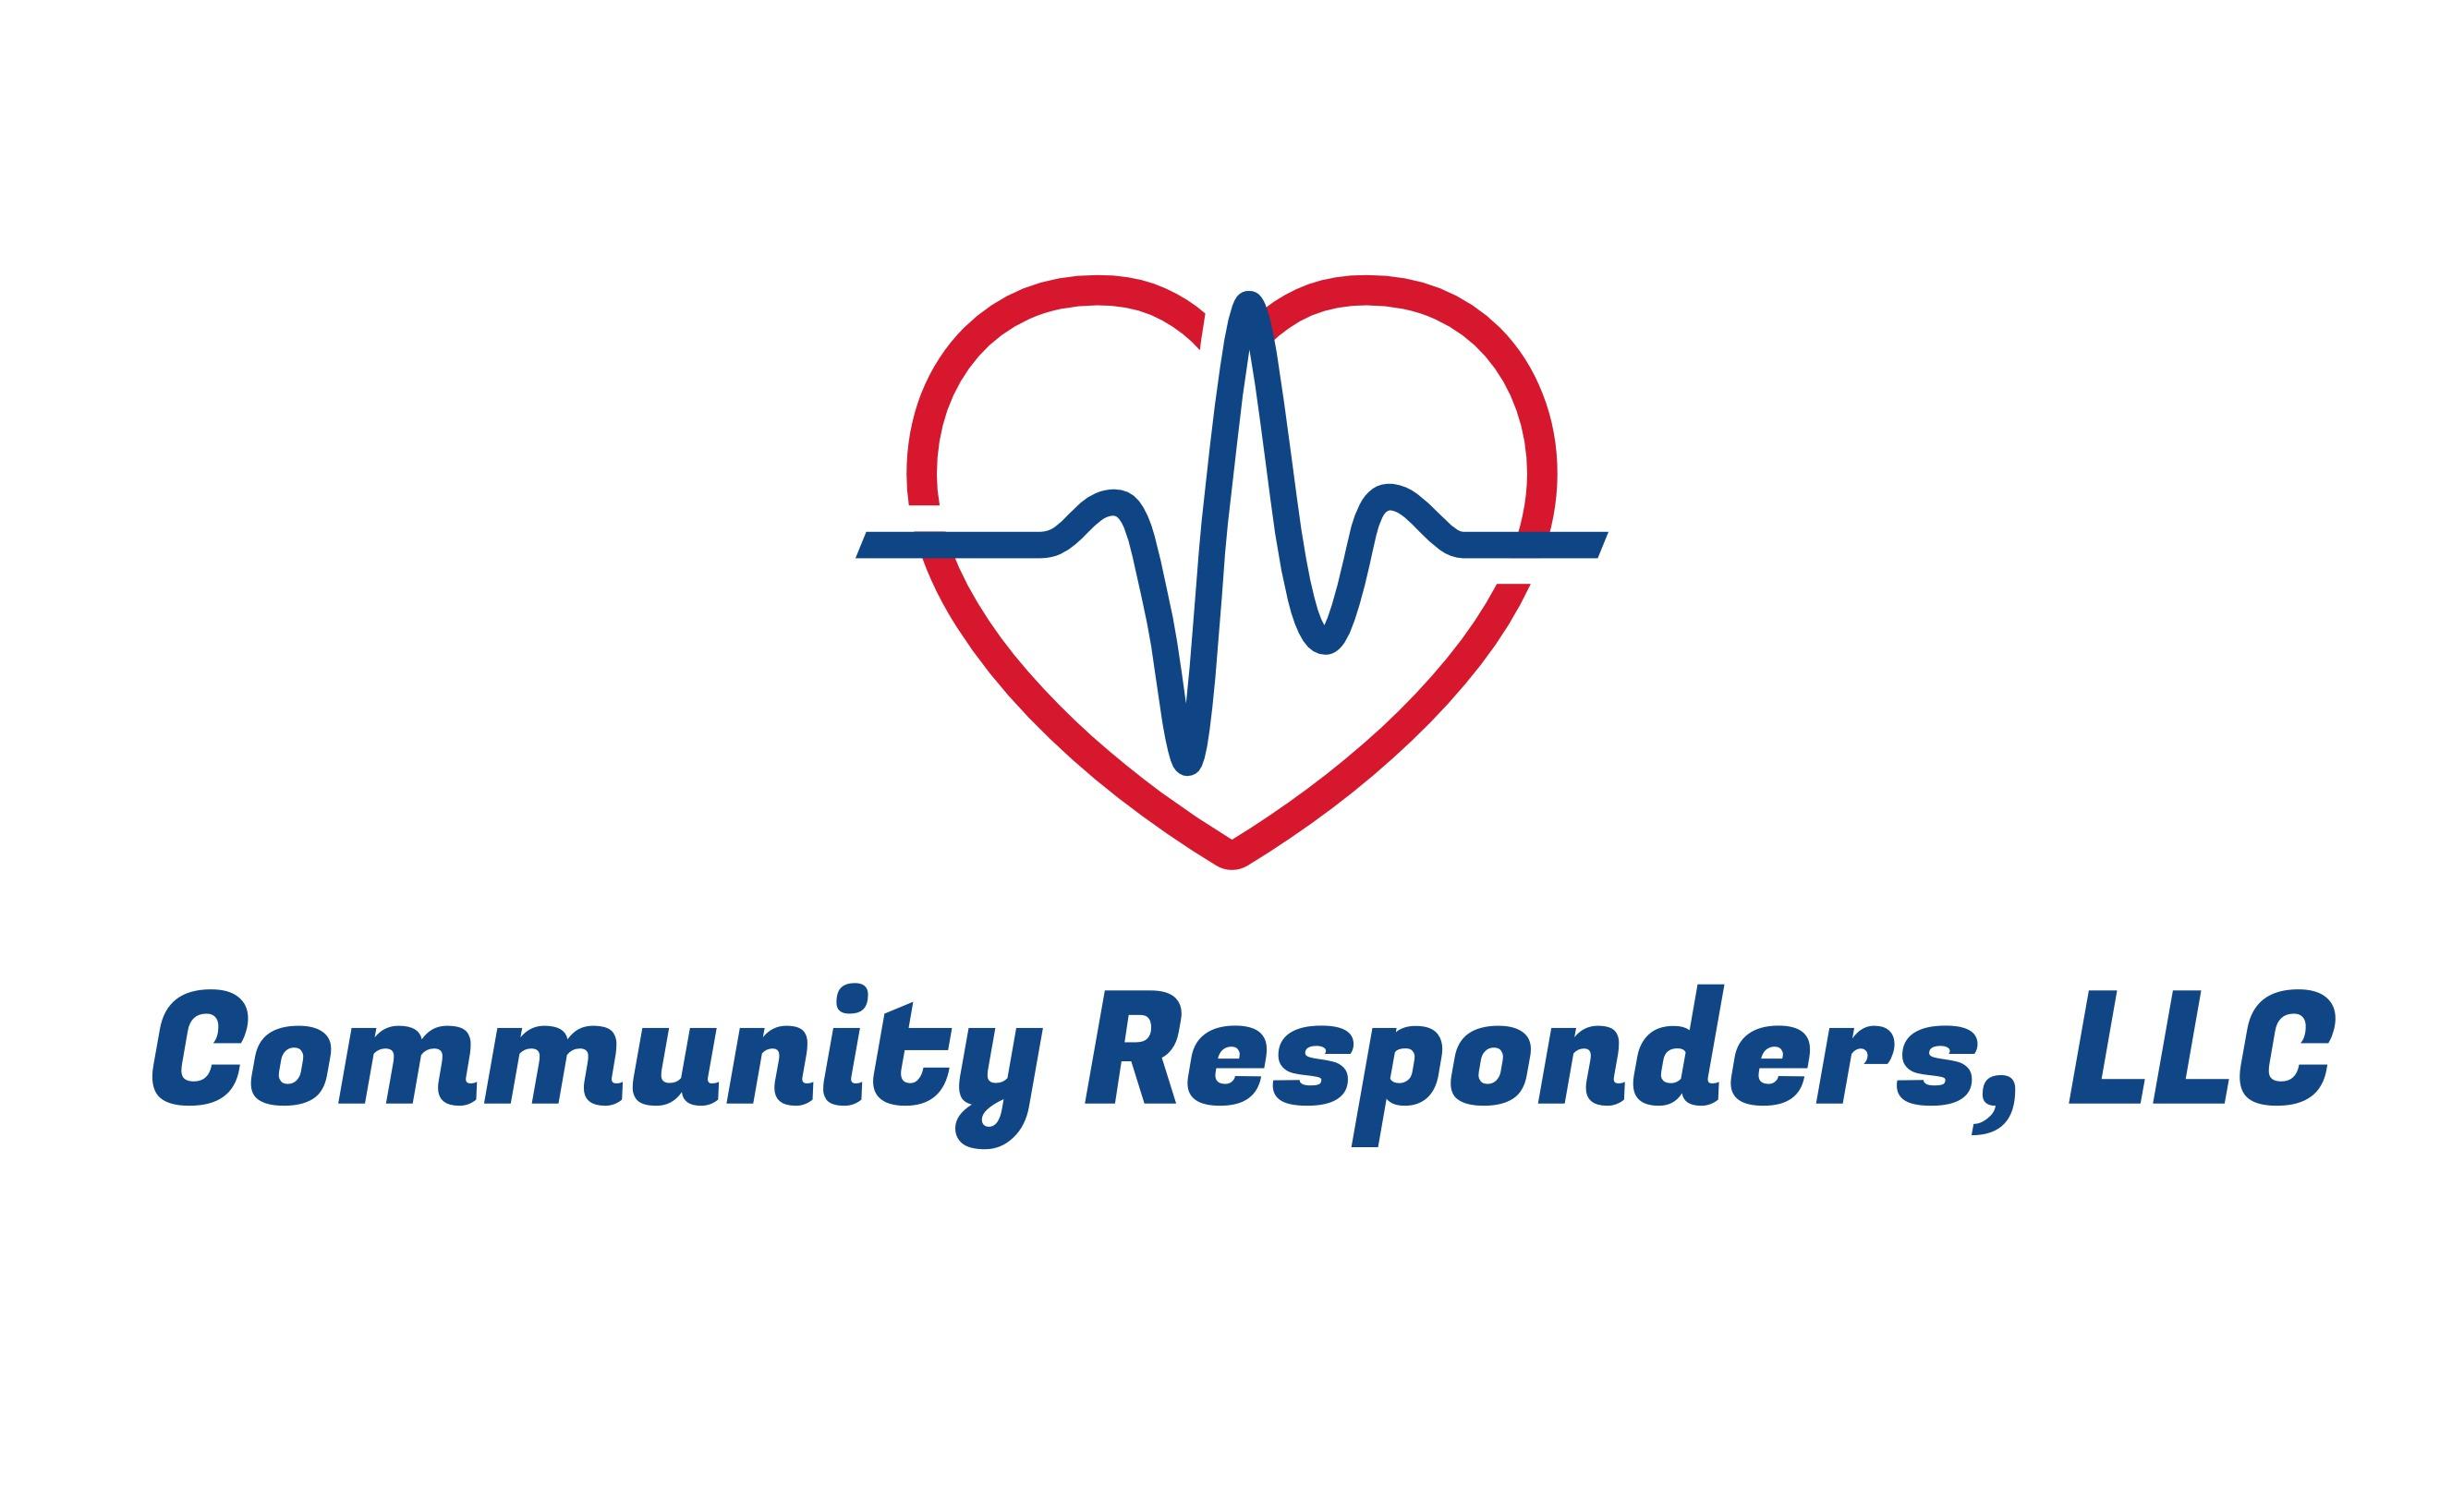 Community Responders LLC